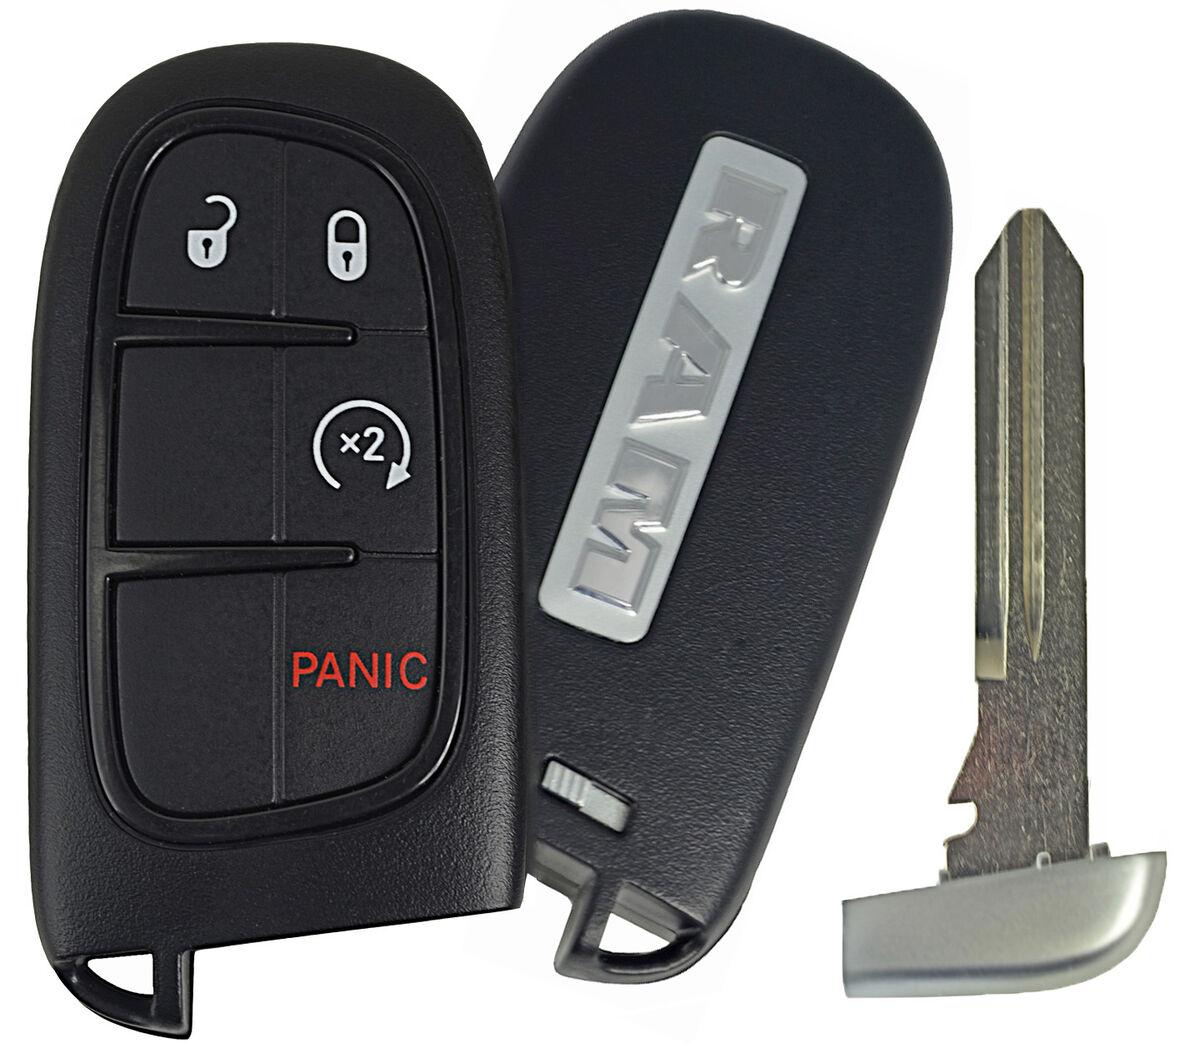 2013 2014 Dodge RAM 1500 2500 3500 Truck Remote Fobik Key Fob Transmitter 4 But